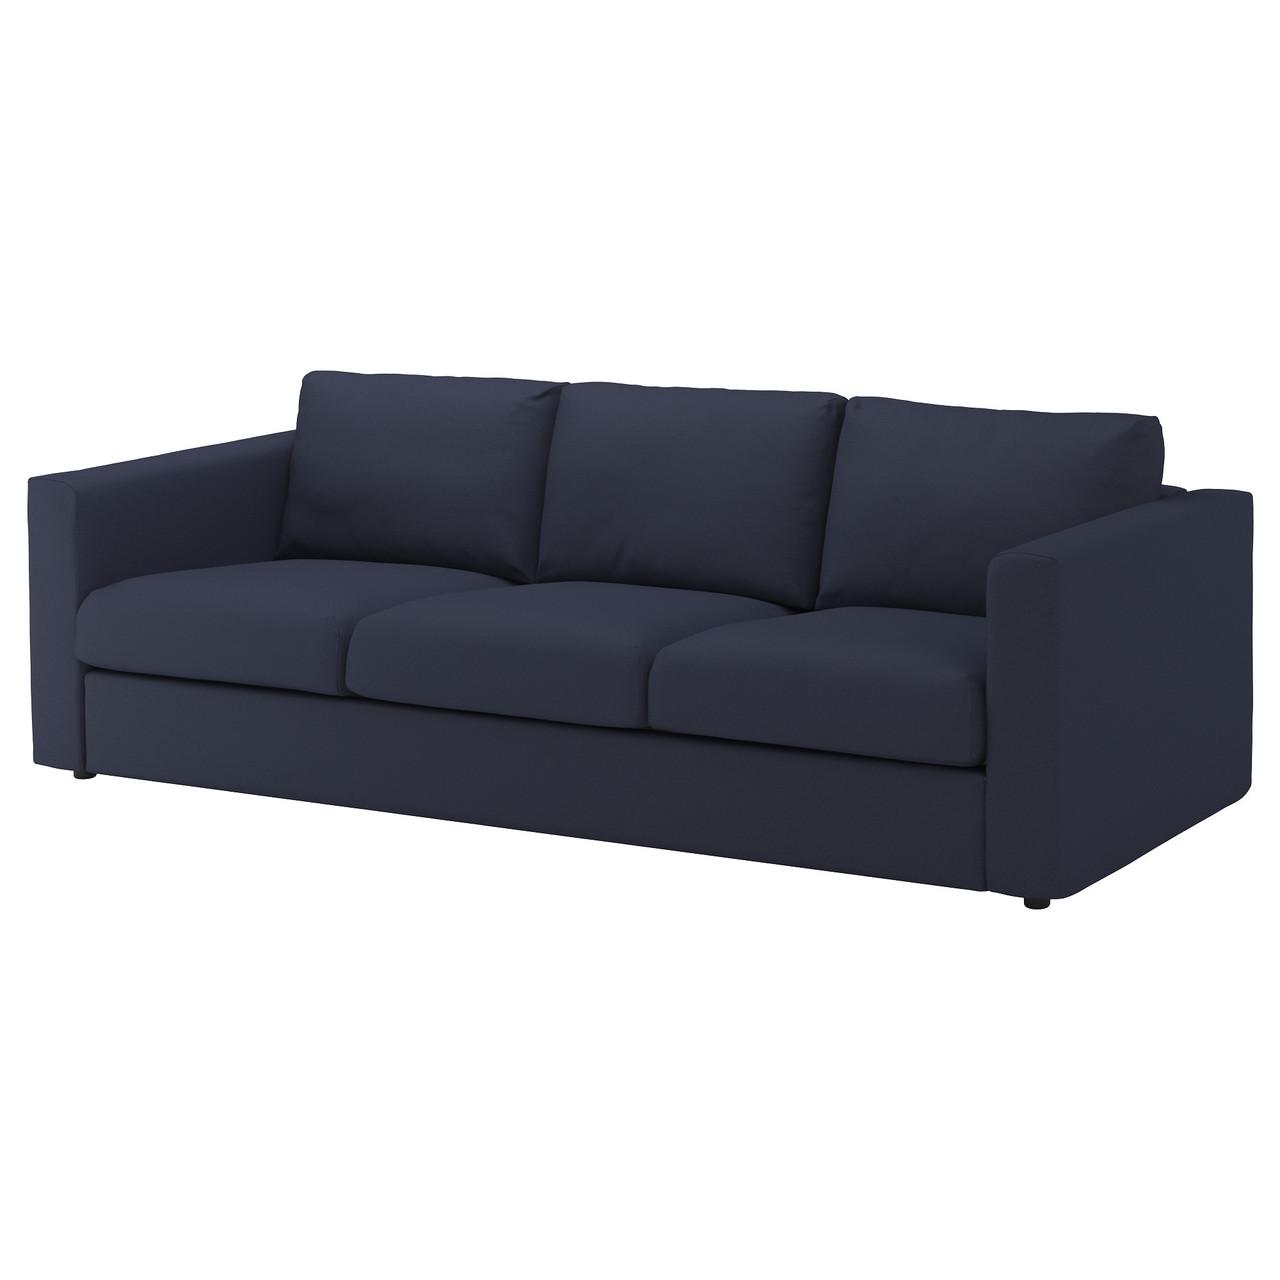 3-местный диван IKEA VIMLE Orrsta темно-синий 392.847.57